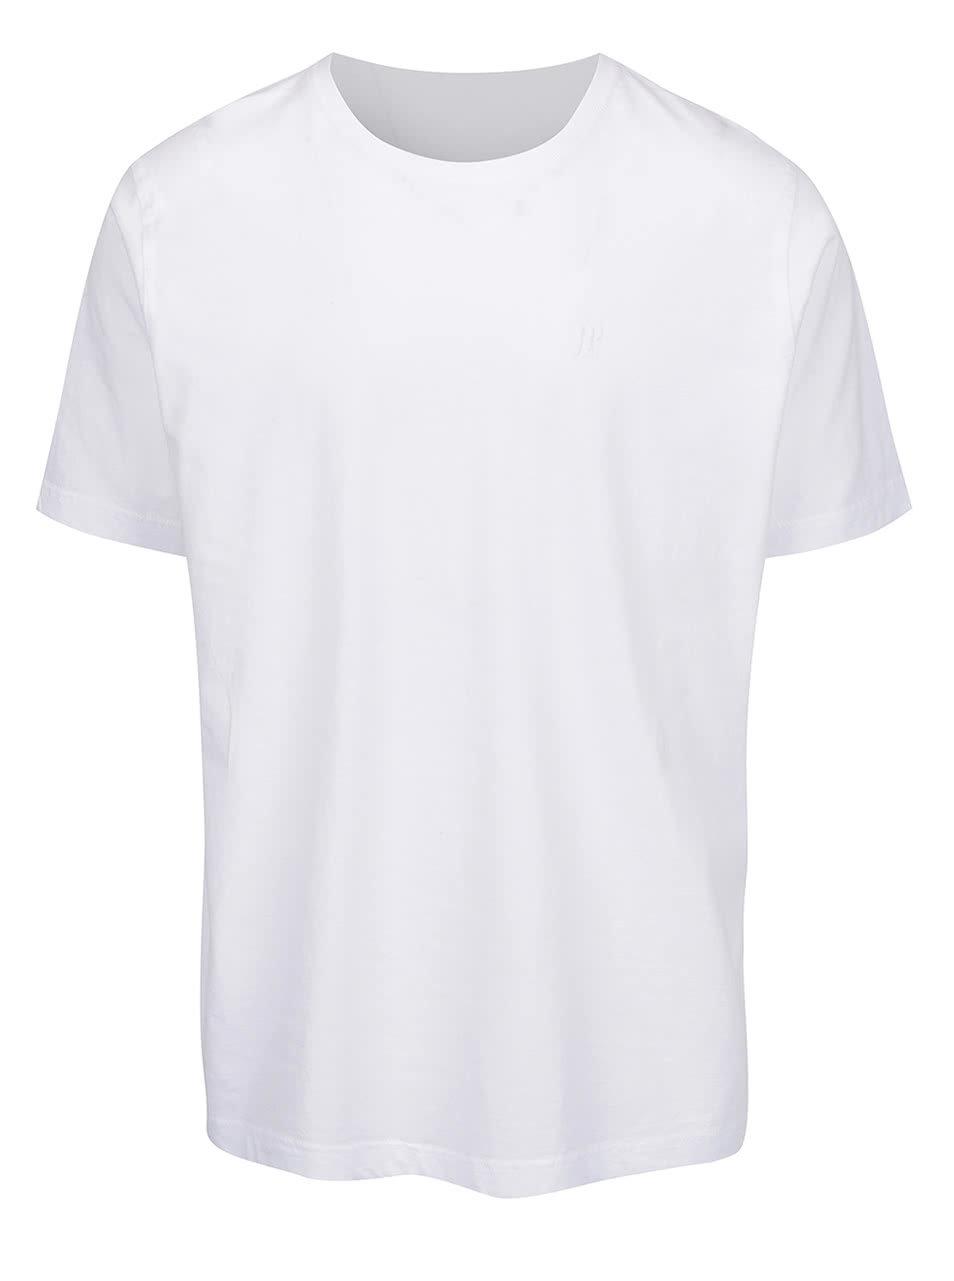 37875bab7aeb Biele tričko s logom JP 1880 ...